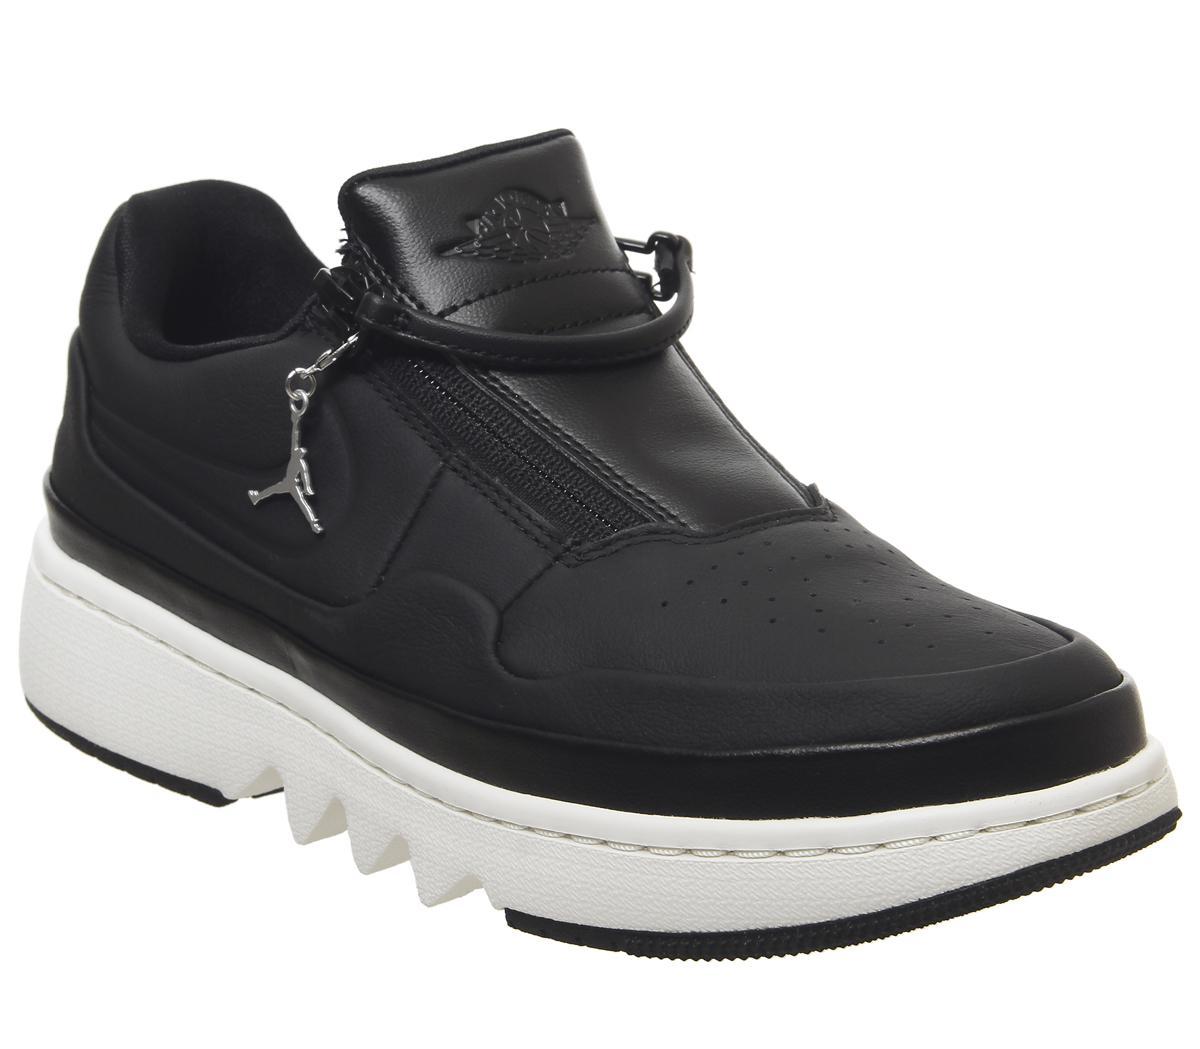 Air Jordan 1 Jester Trainers